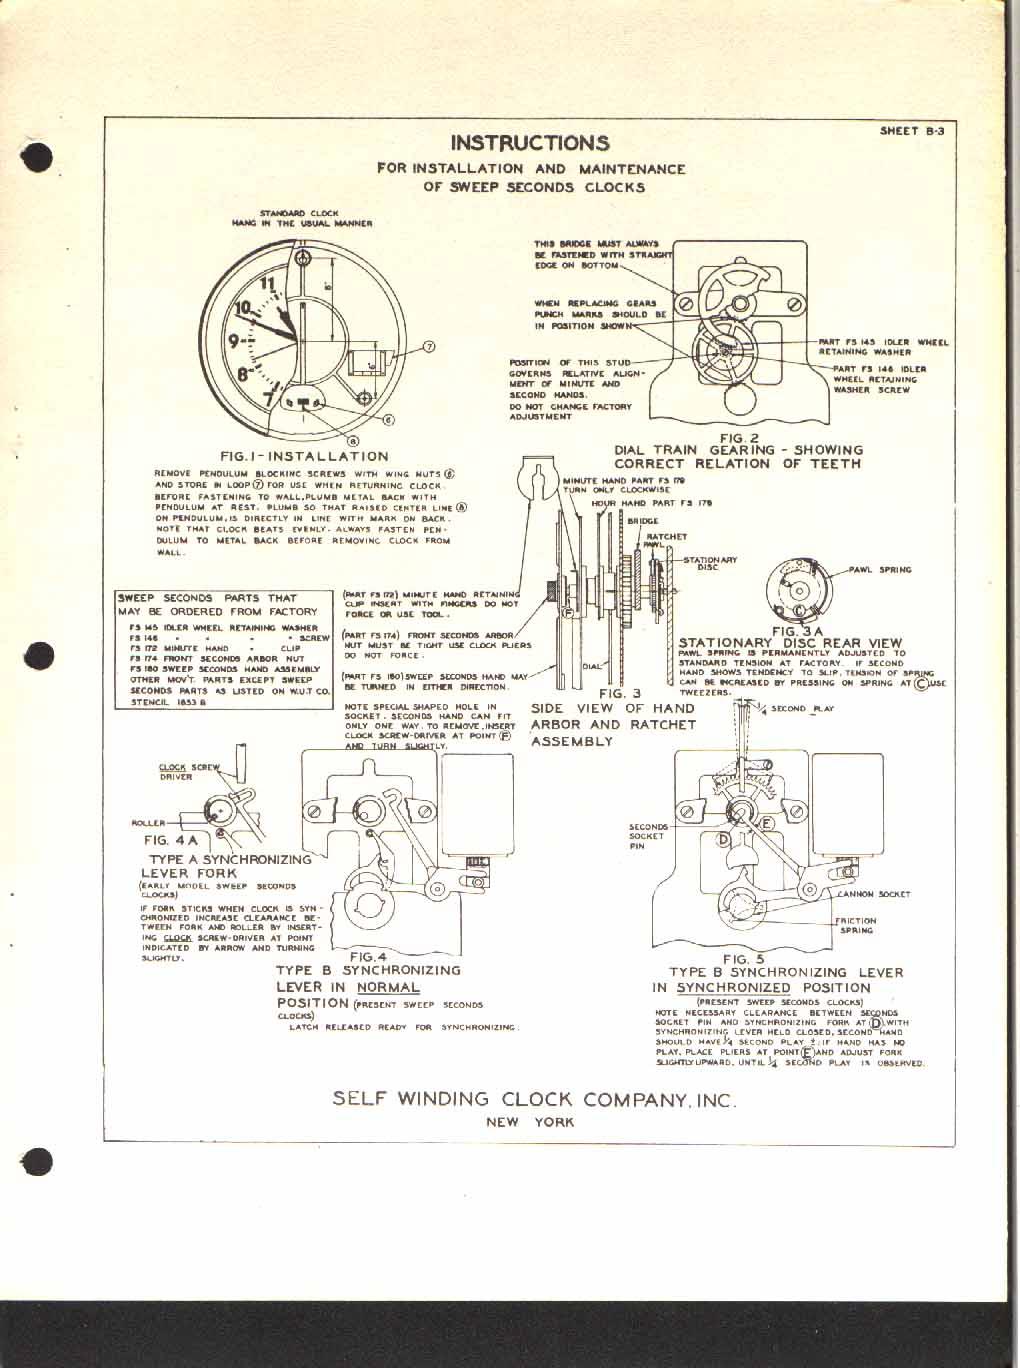 Ftl Design Electric Clocks Self Winding Clock Company